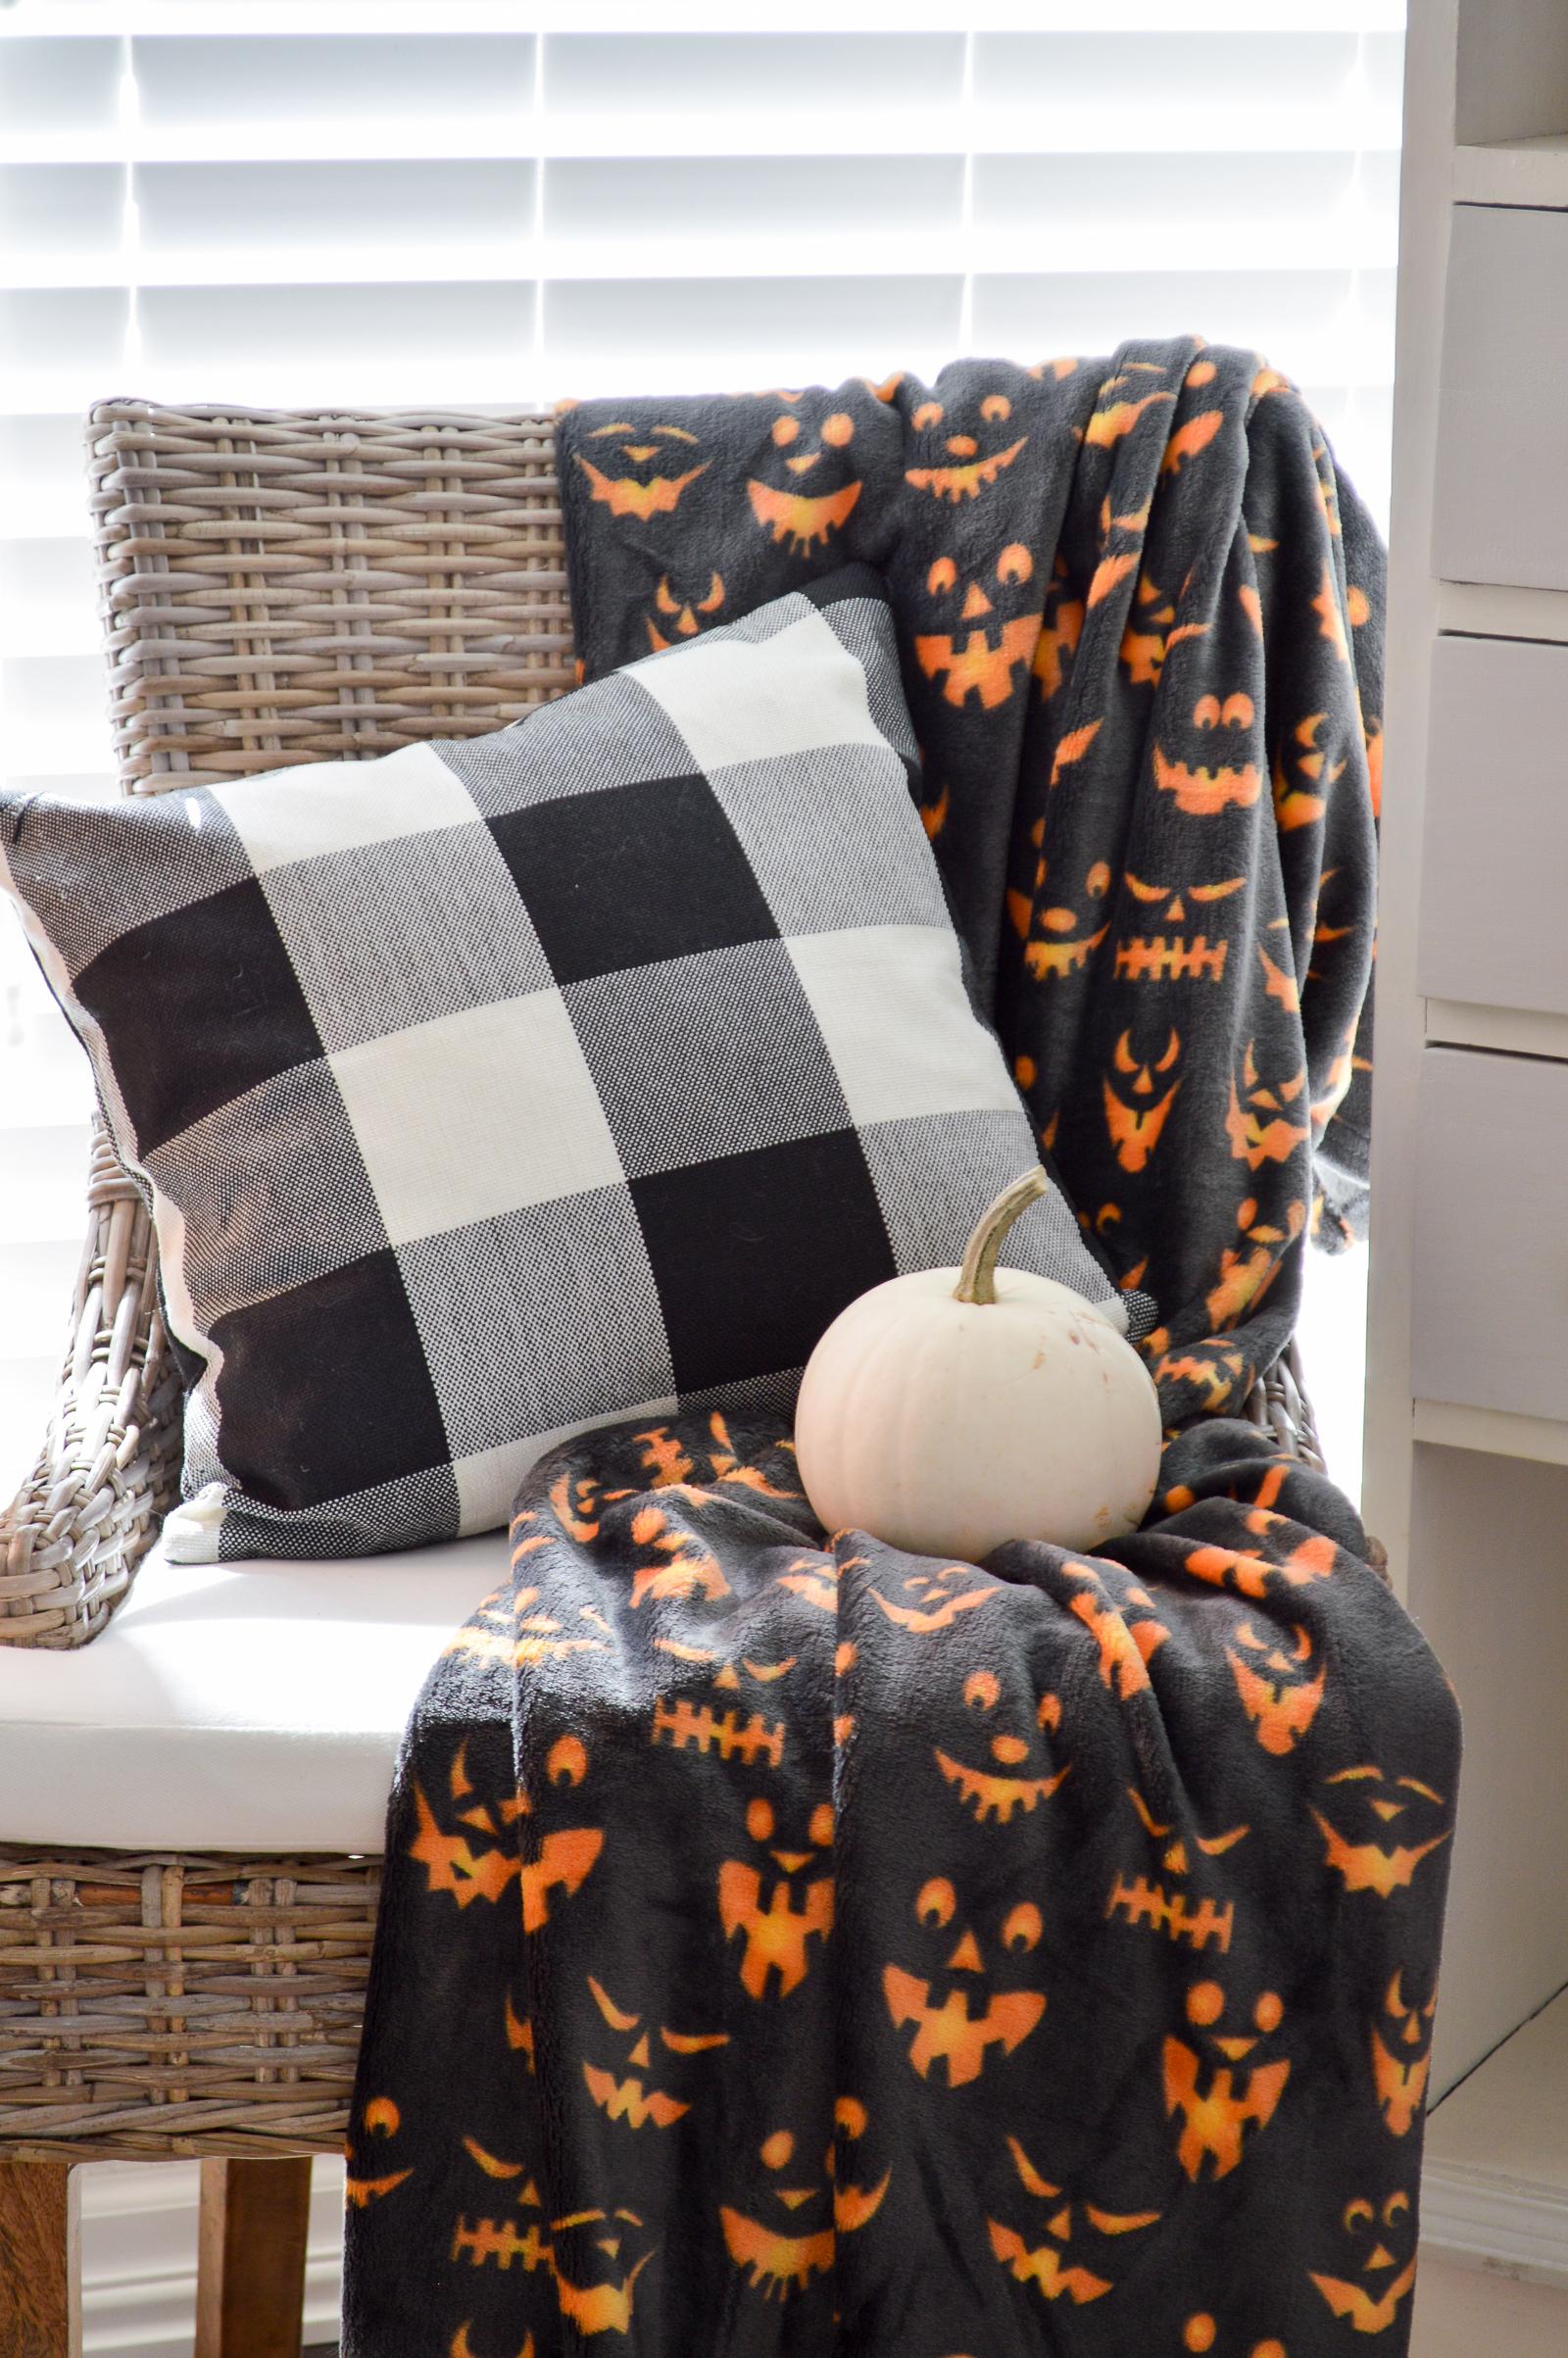 Haunted Halloween Decorating in the Sun Room